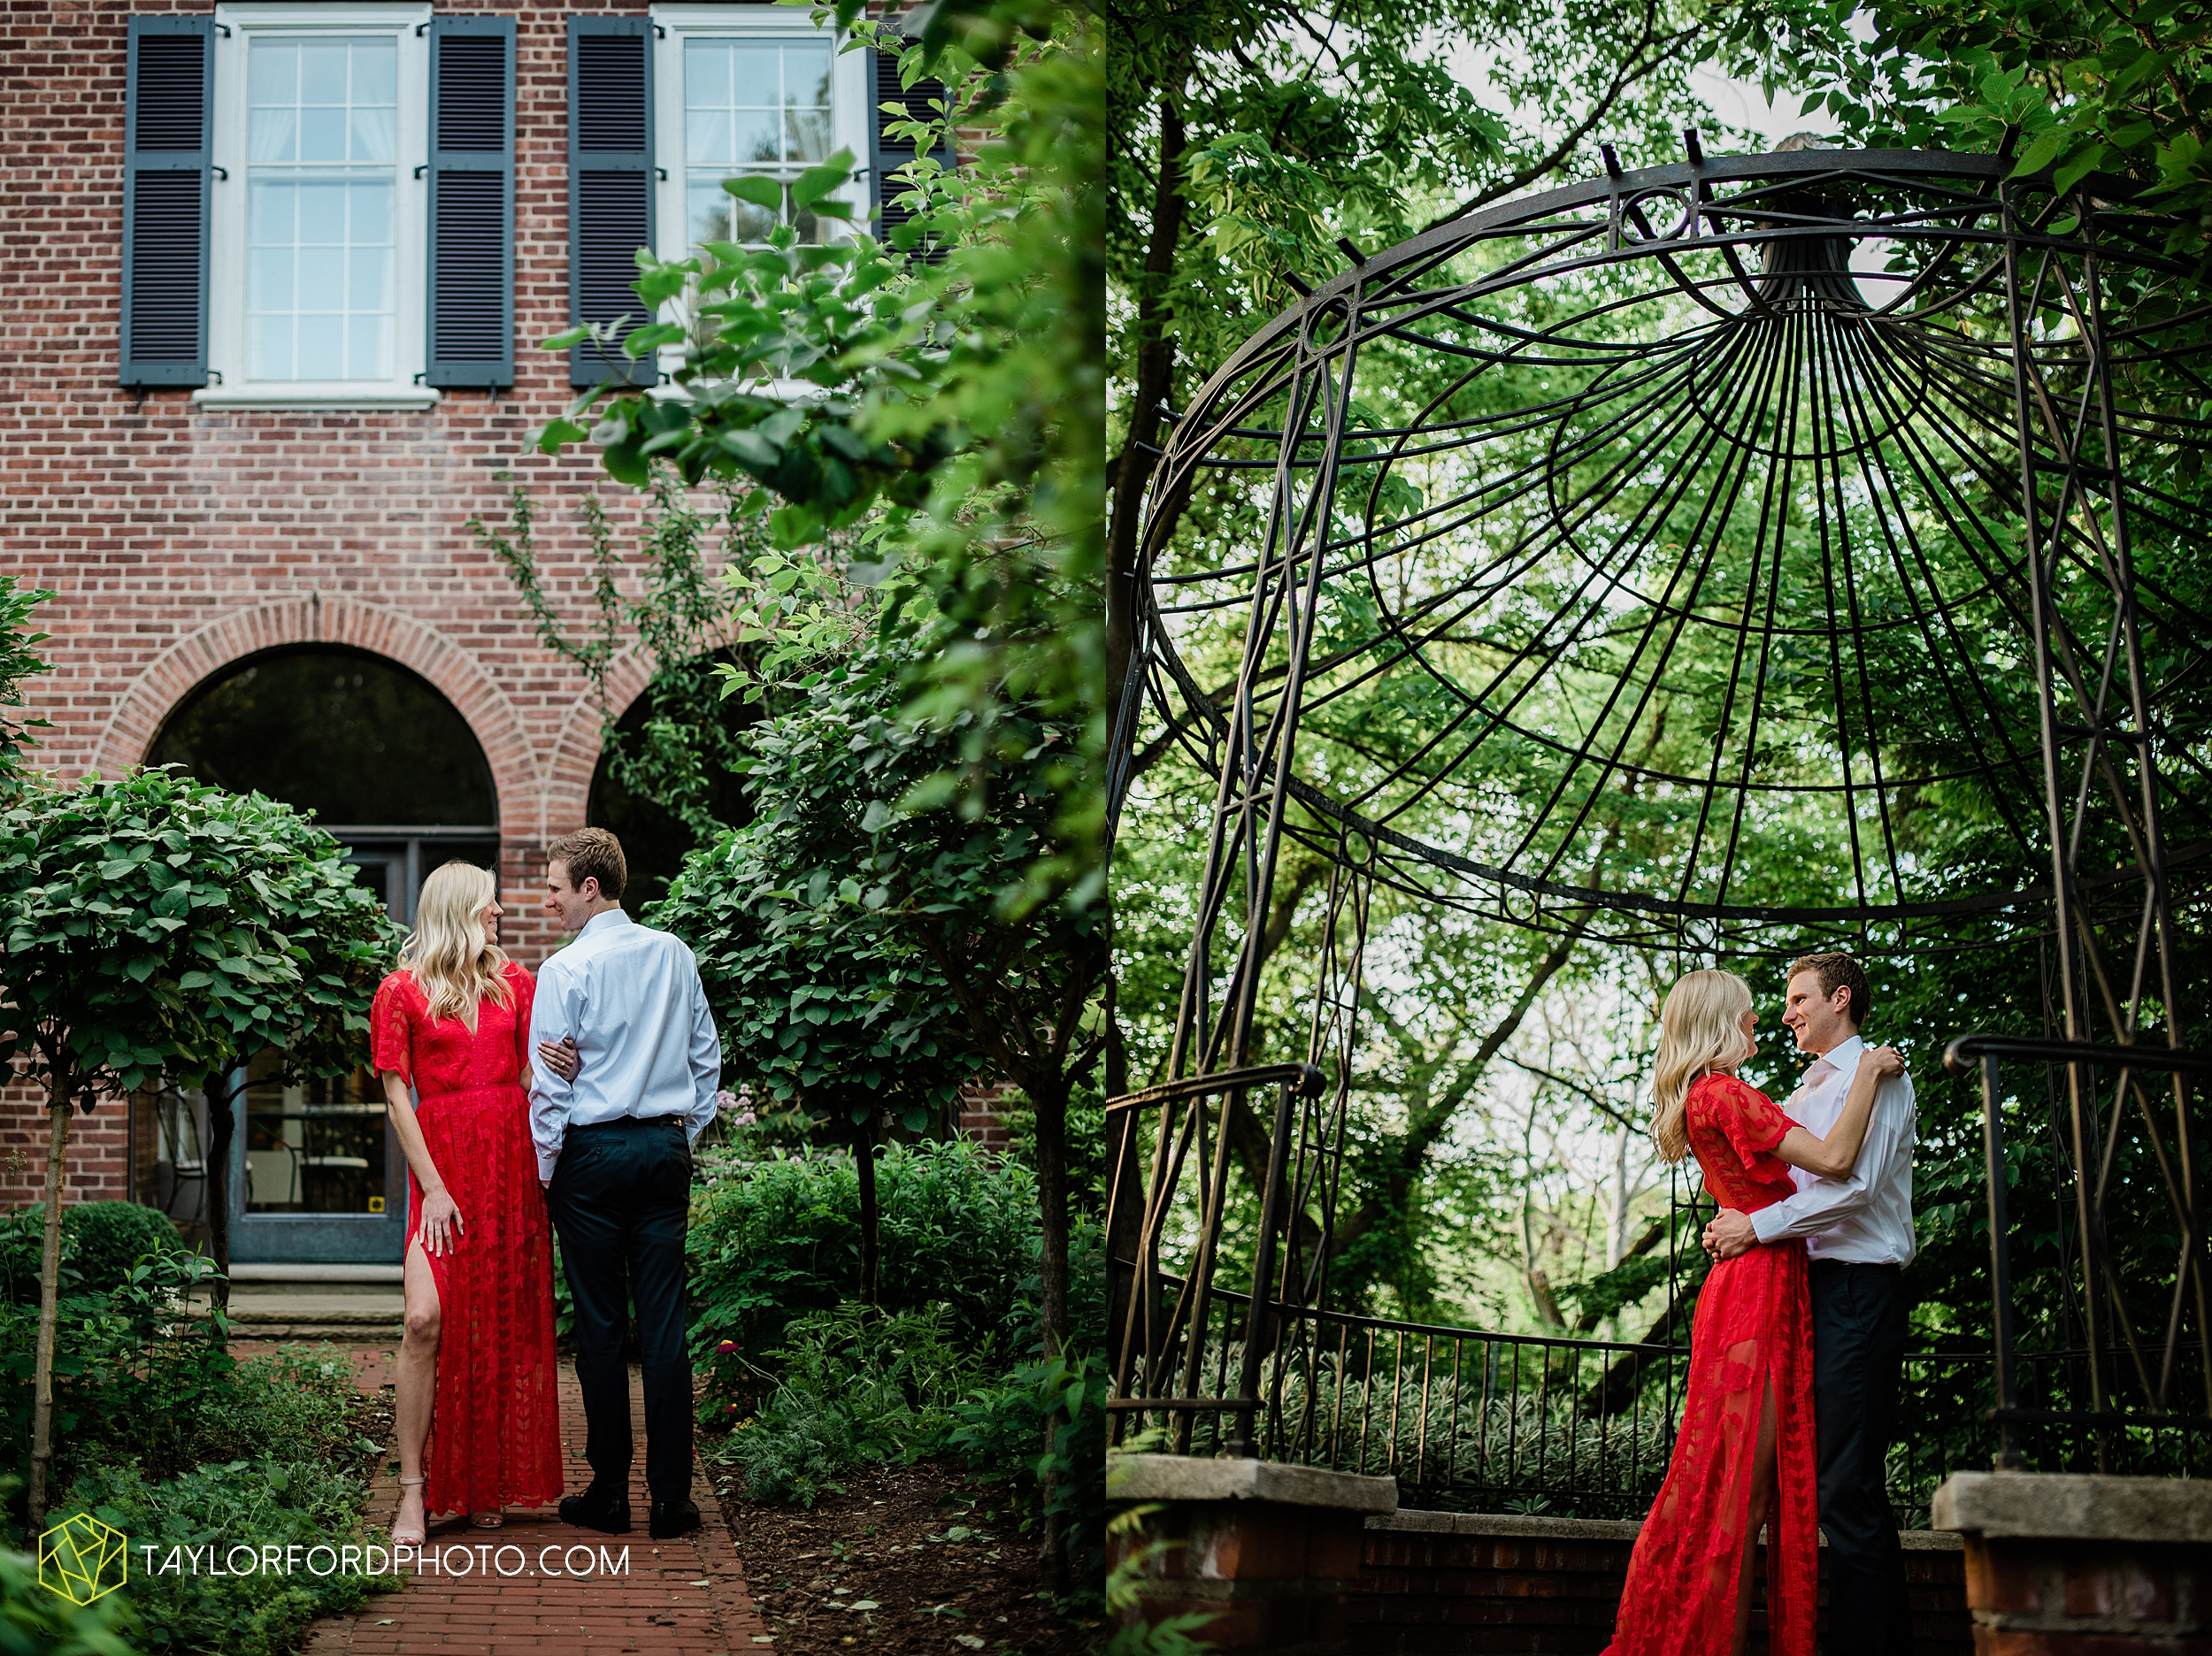 toledo-ohio-wildwood-preserve-metropark-manor-house-engagement-photographer-photography-taylor-ford-hirschy-photographer_3137.jpg